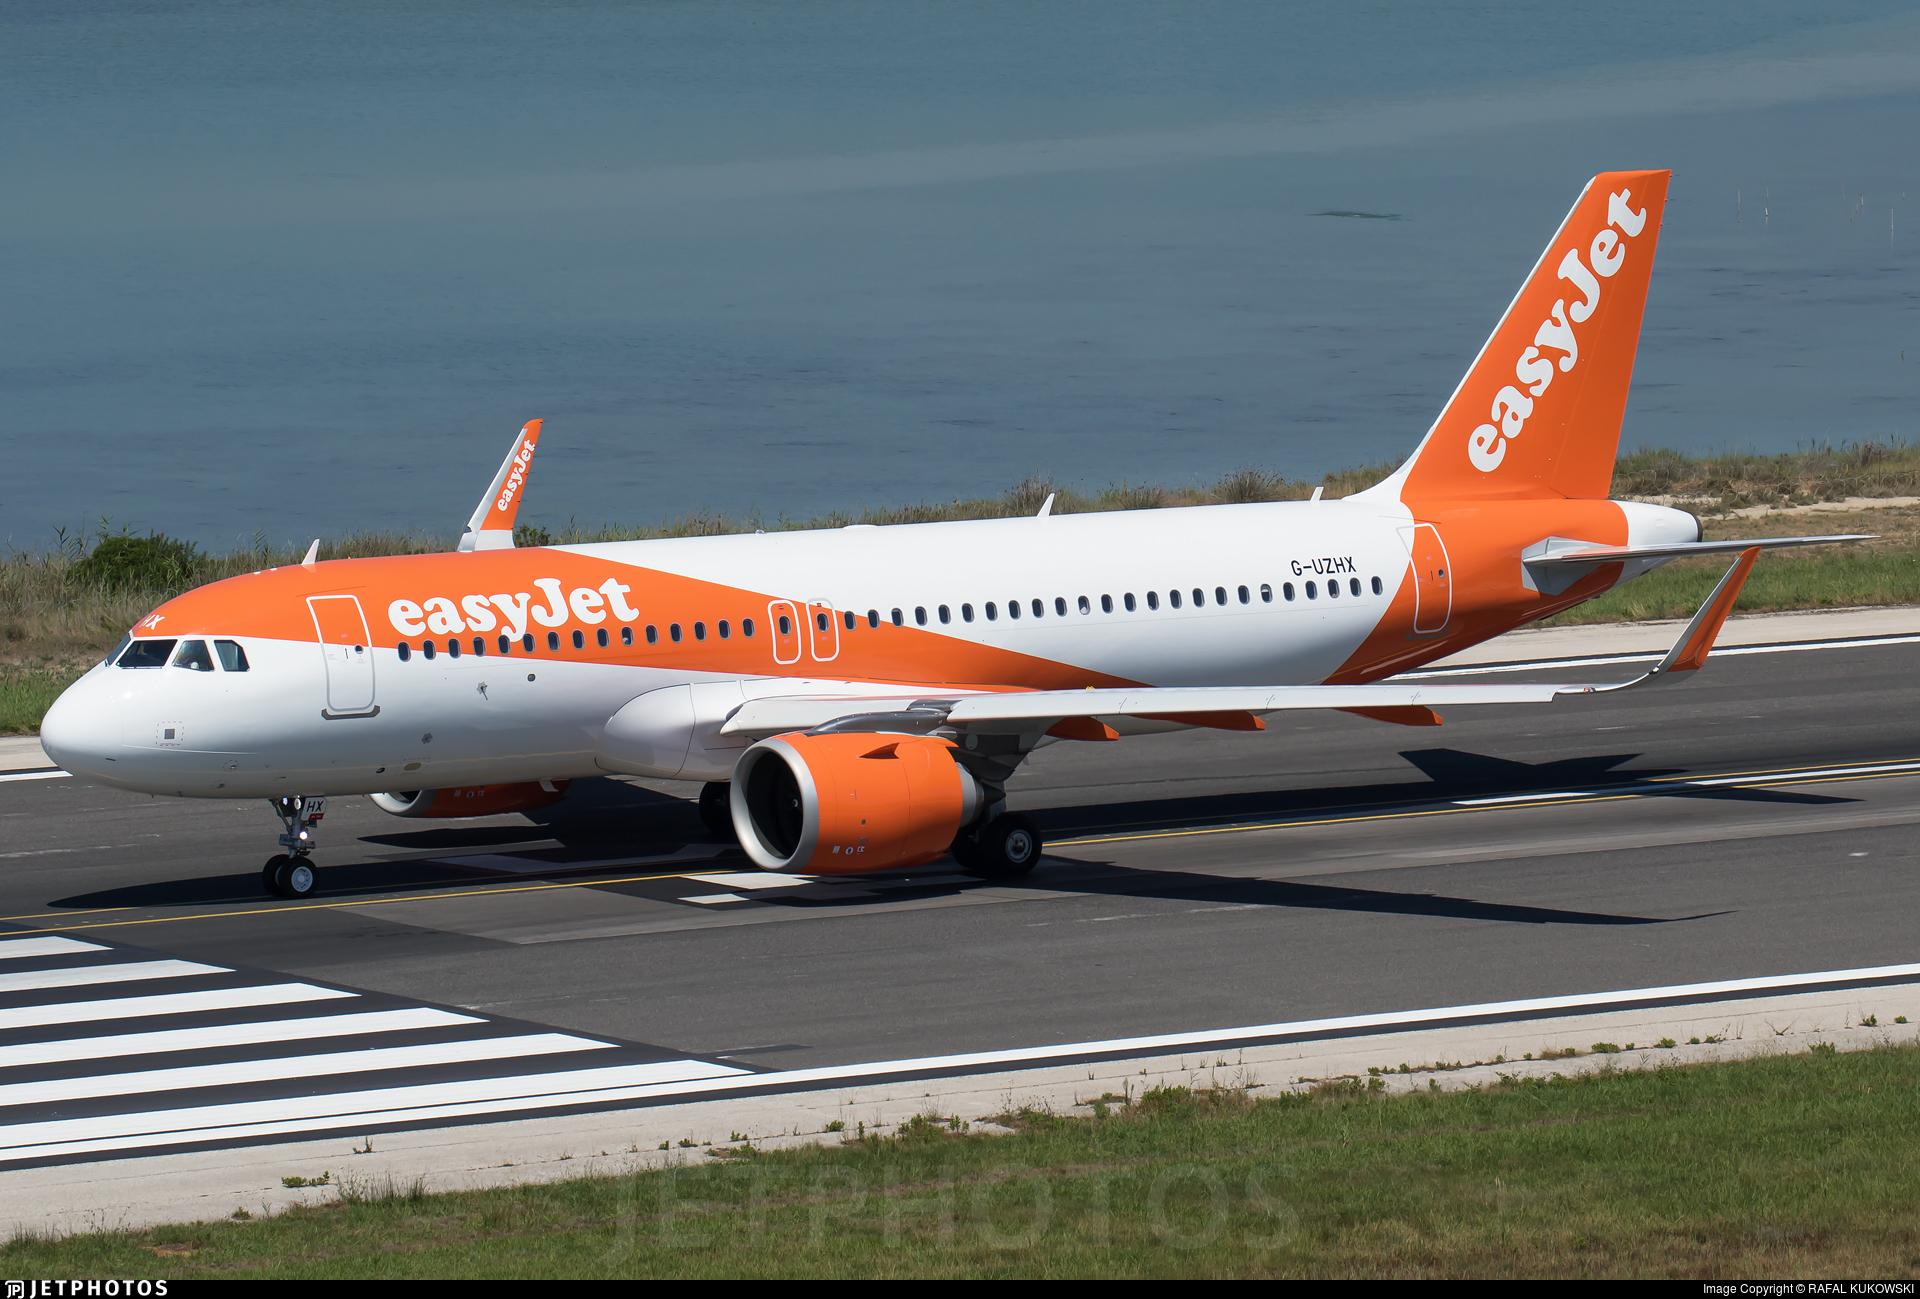 G-UZHX - Airbus A320-251N - easyJet